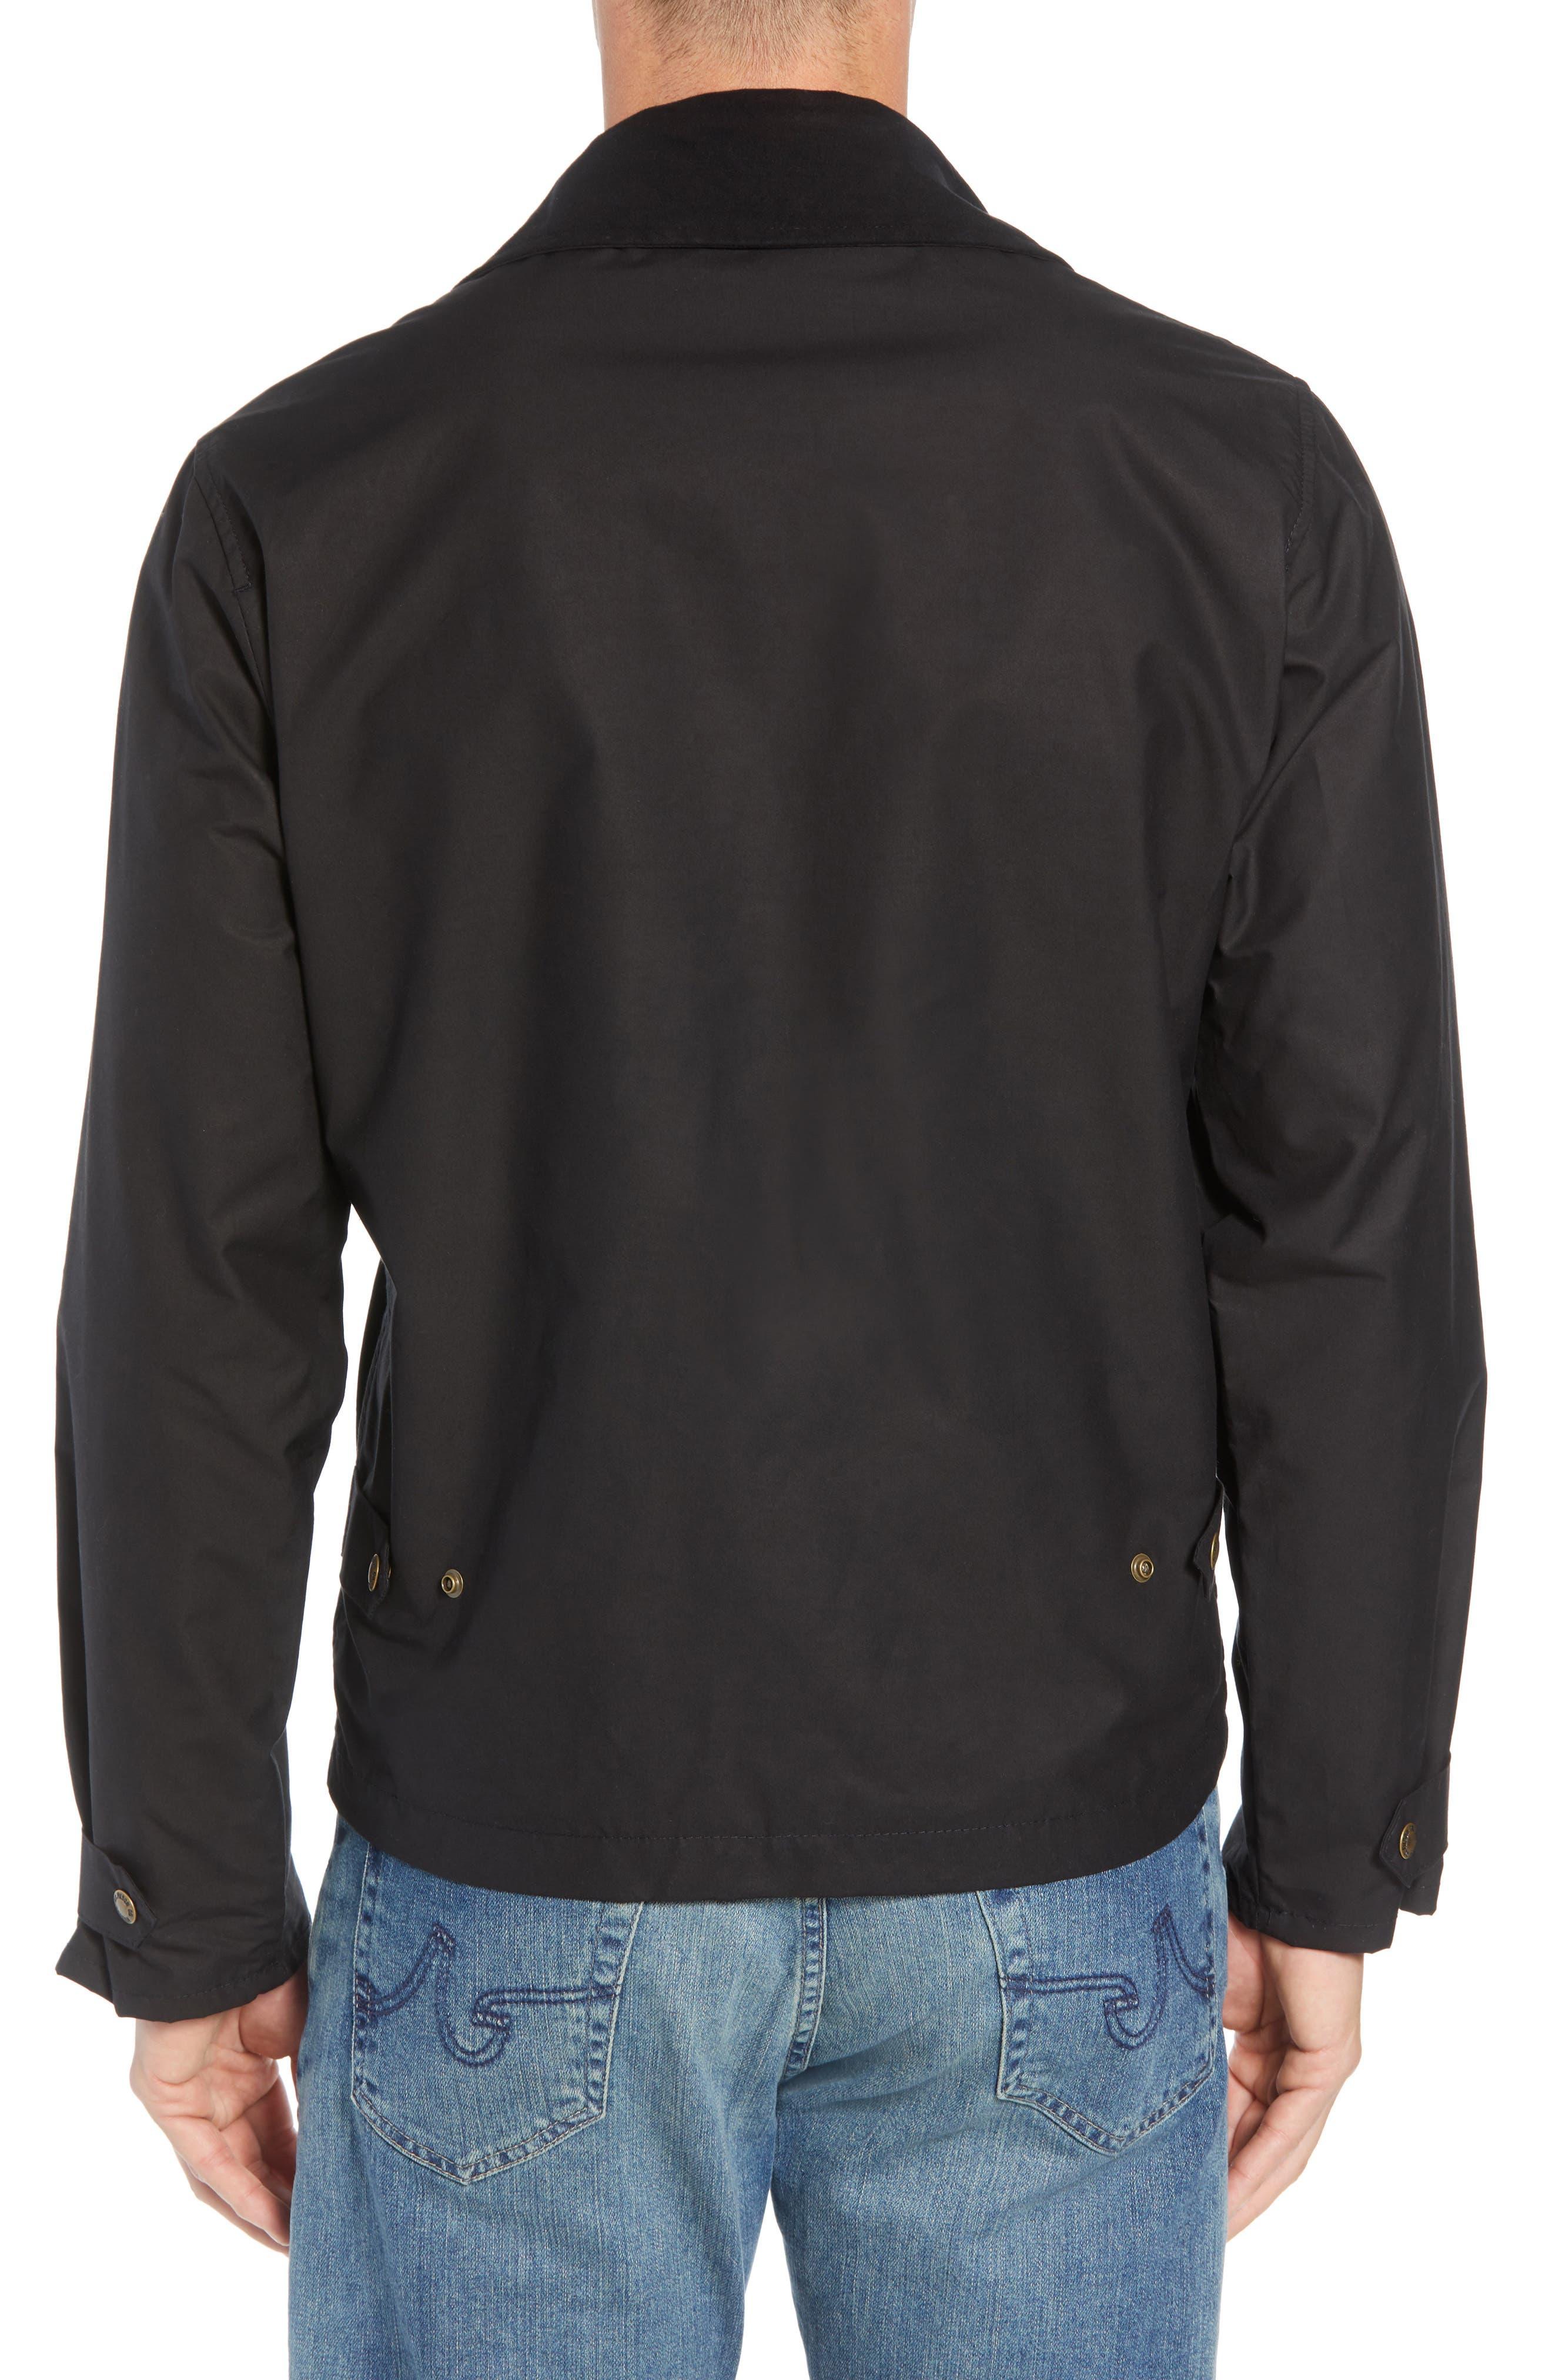 Short Mile Marker Waxed Cotton Jacket,                             Alternate thumbnail 2, color,                             BLACK